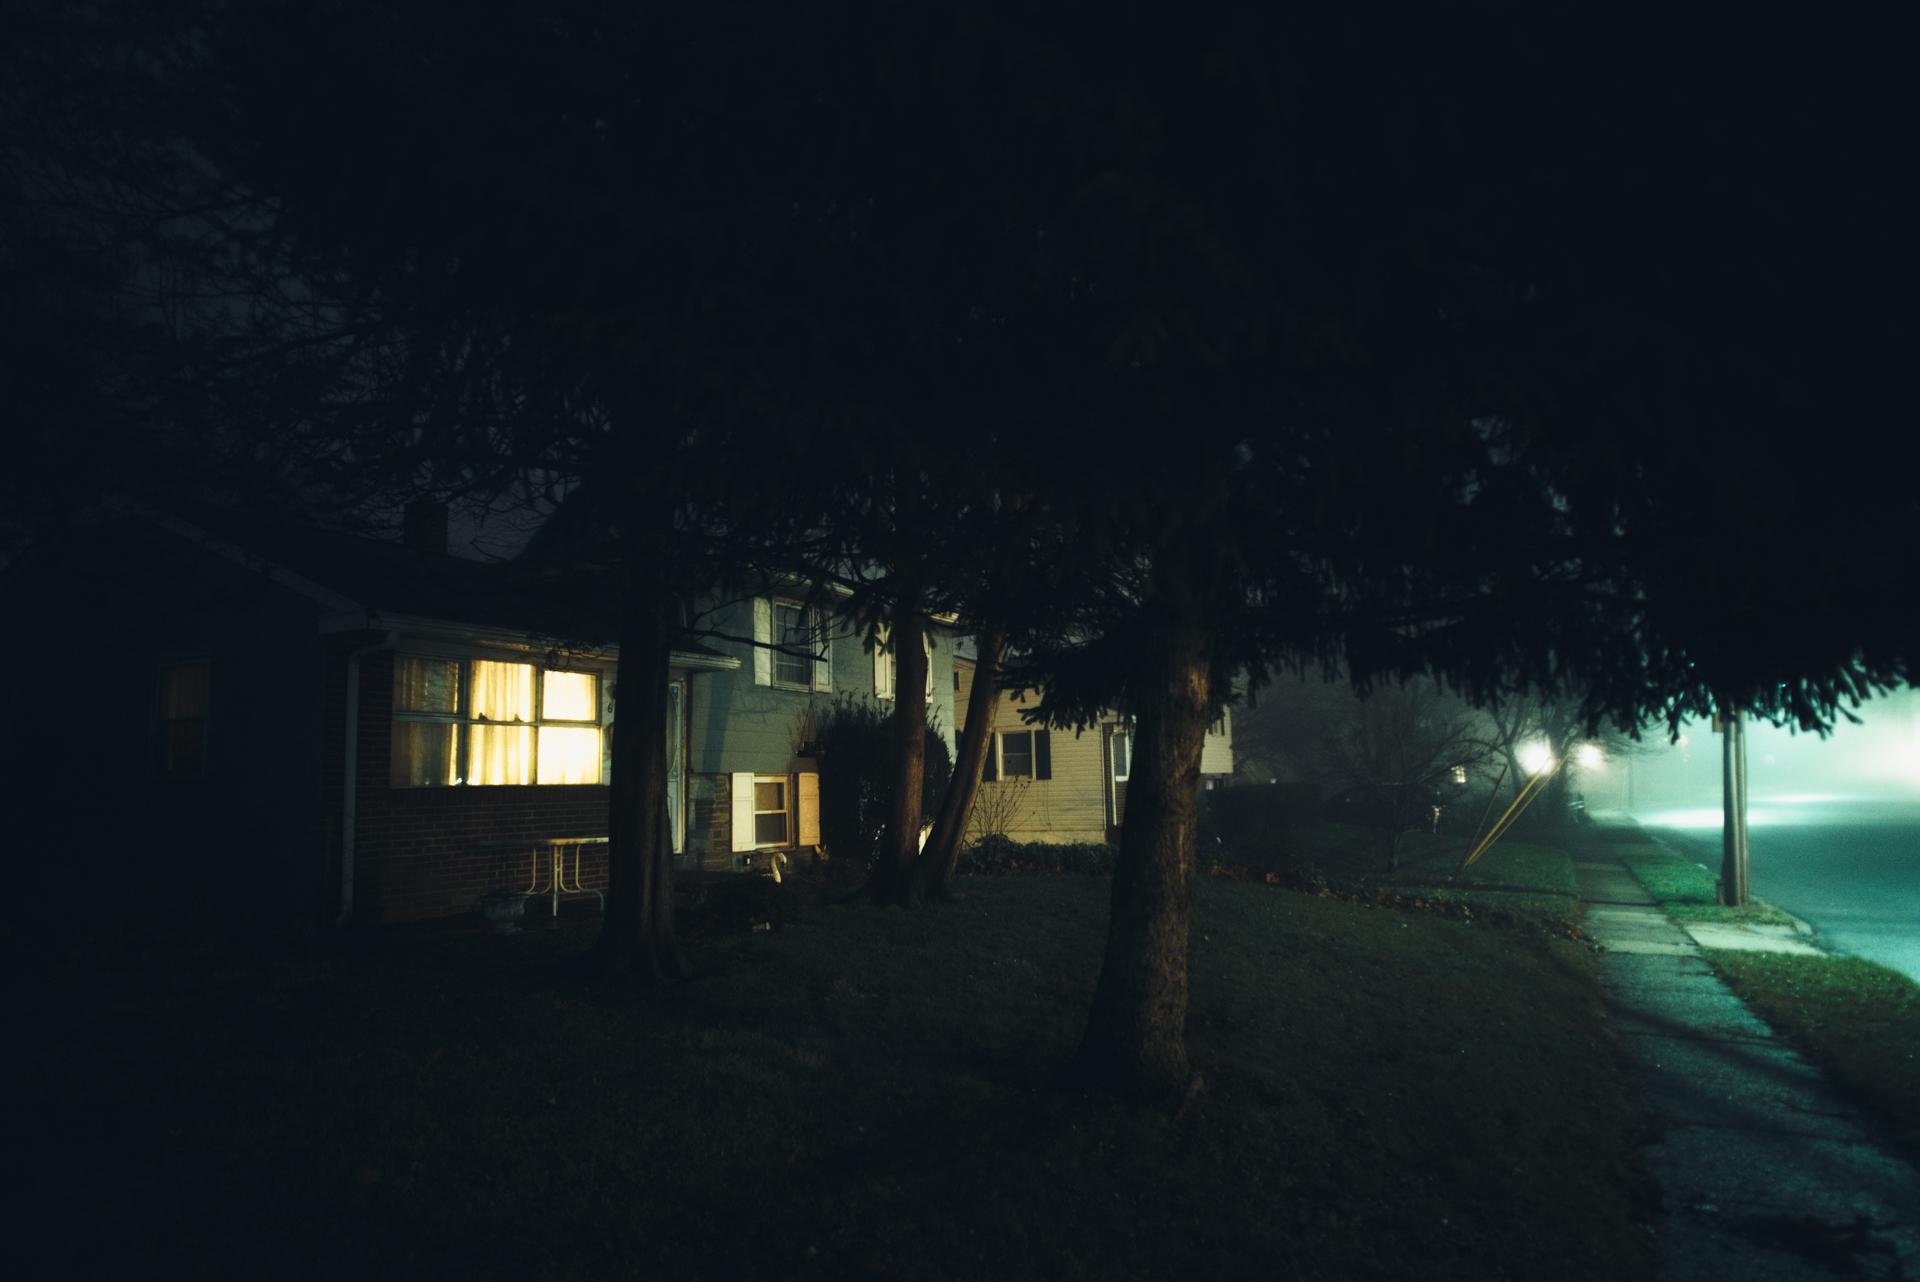 spaces+light-9.jpg